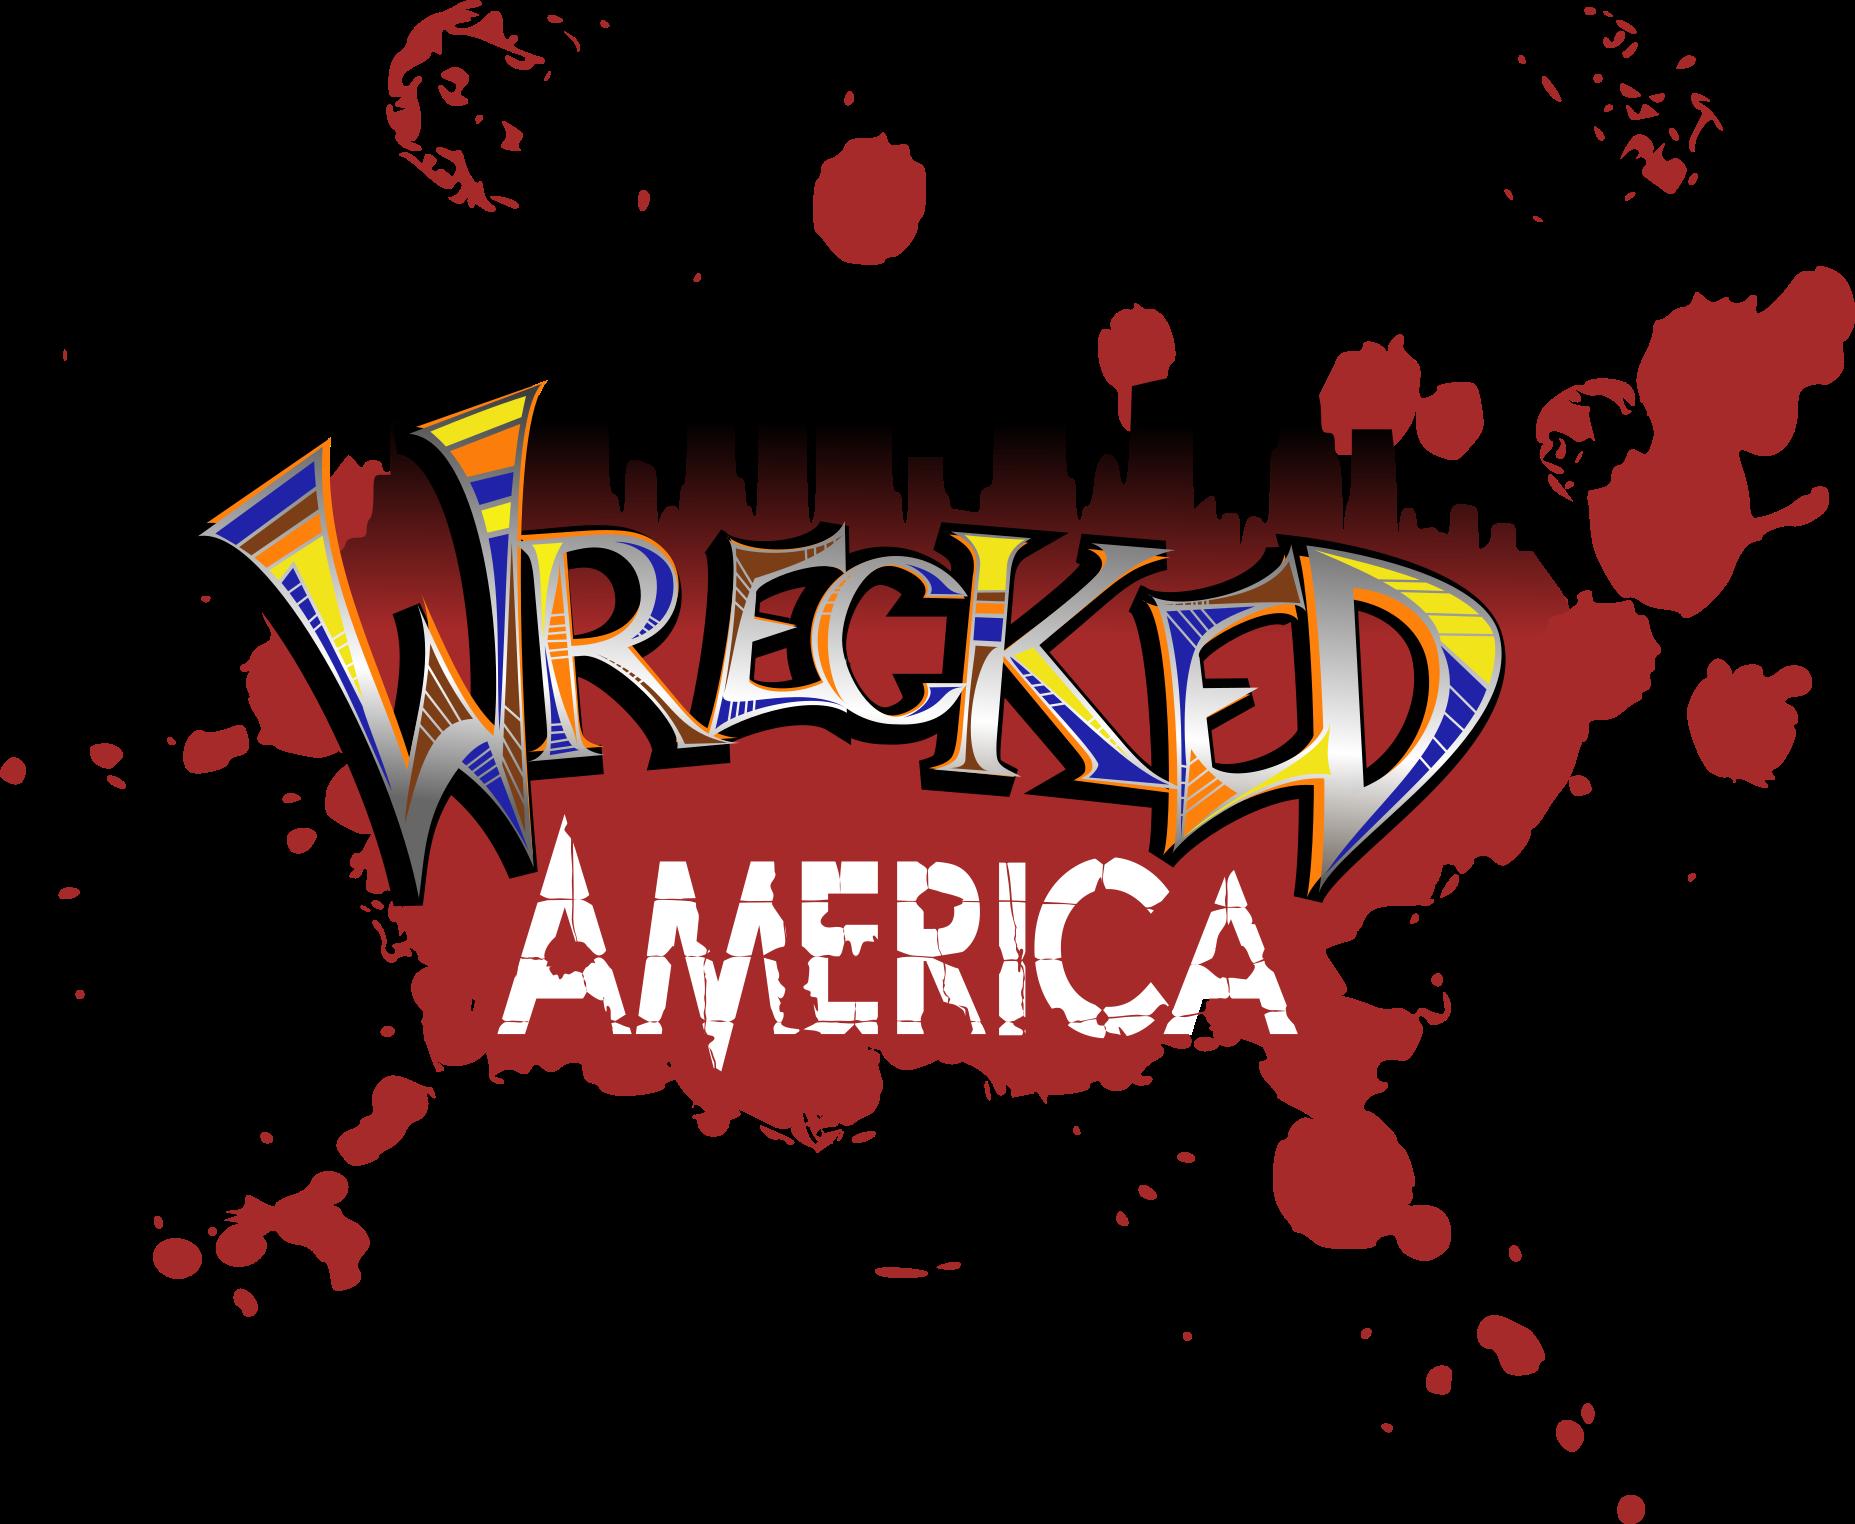 Wrecked America logo